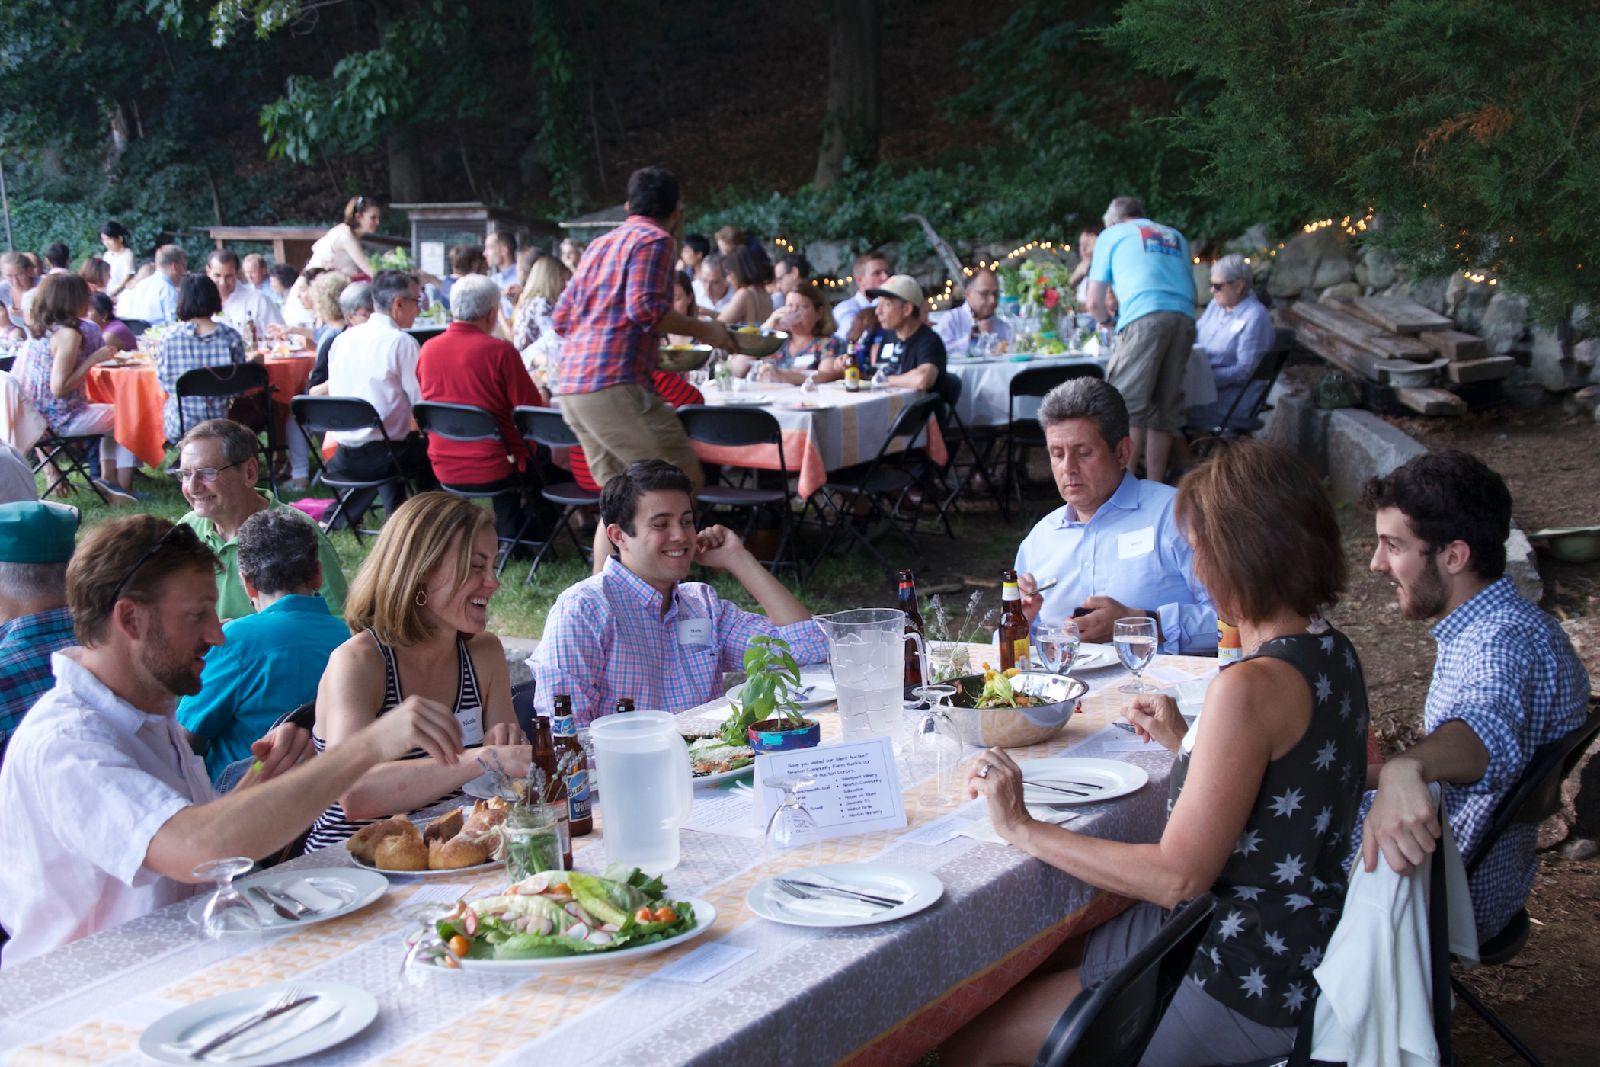 Dinner_on_the_Farm_lg_view_8_17.jpg